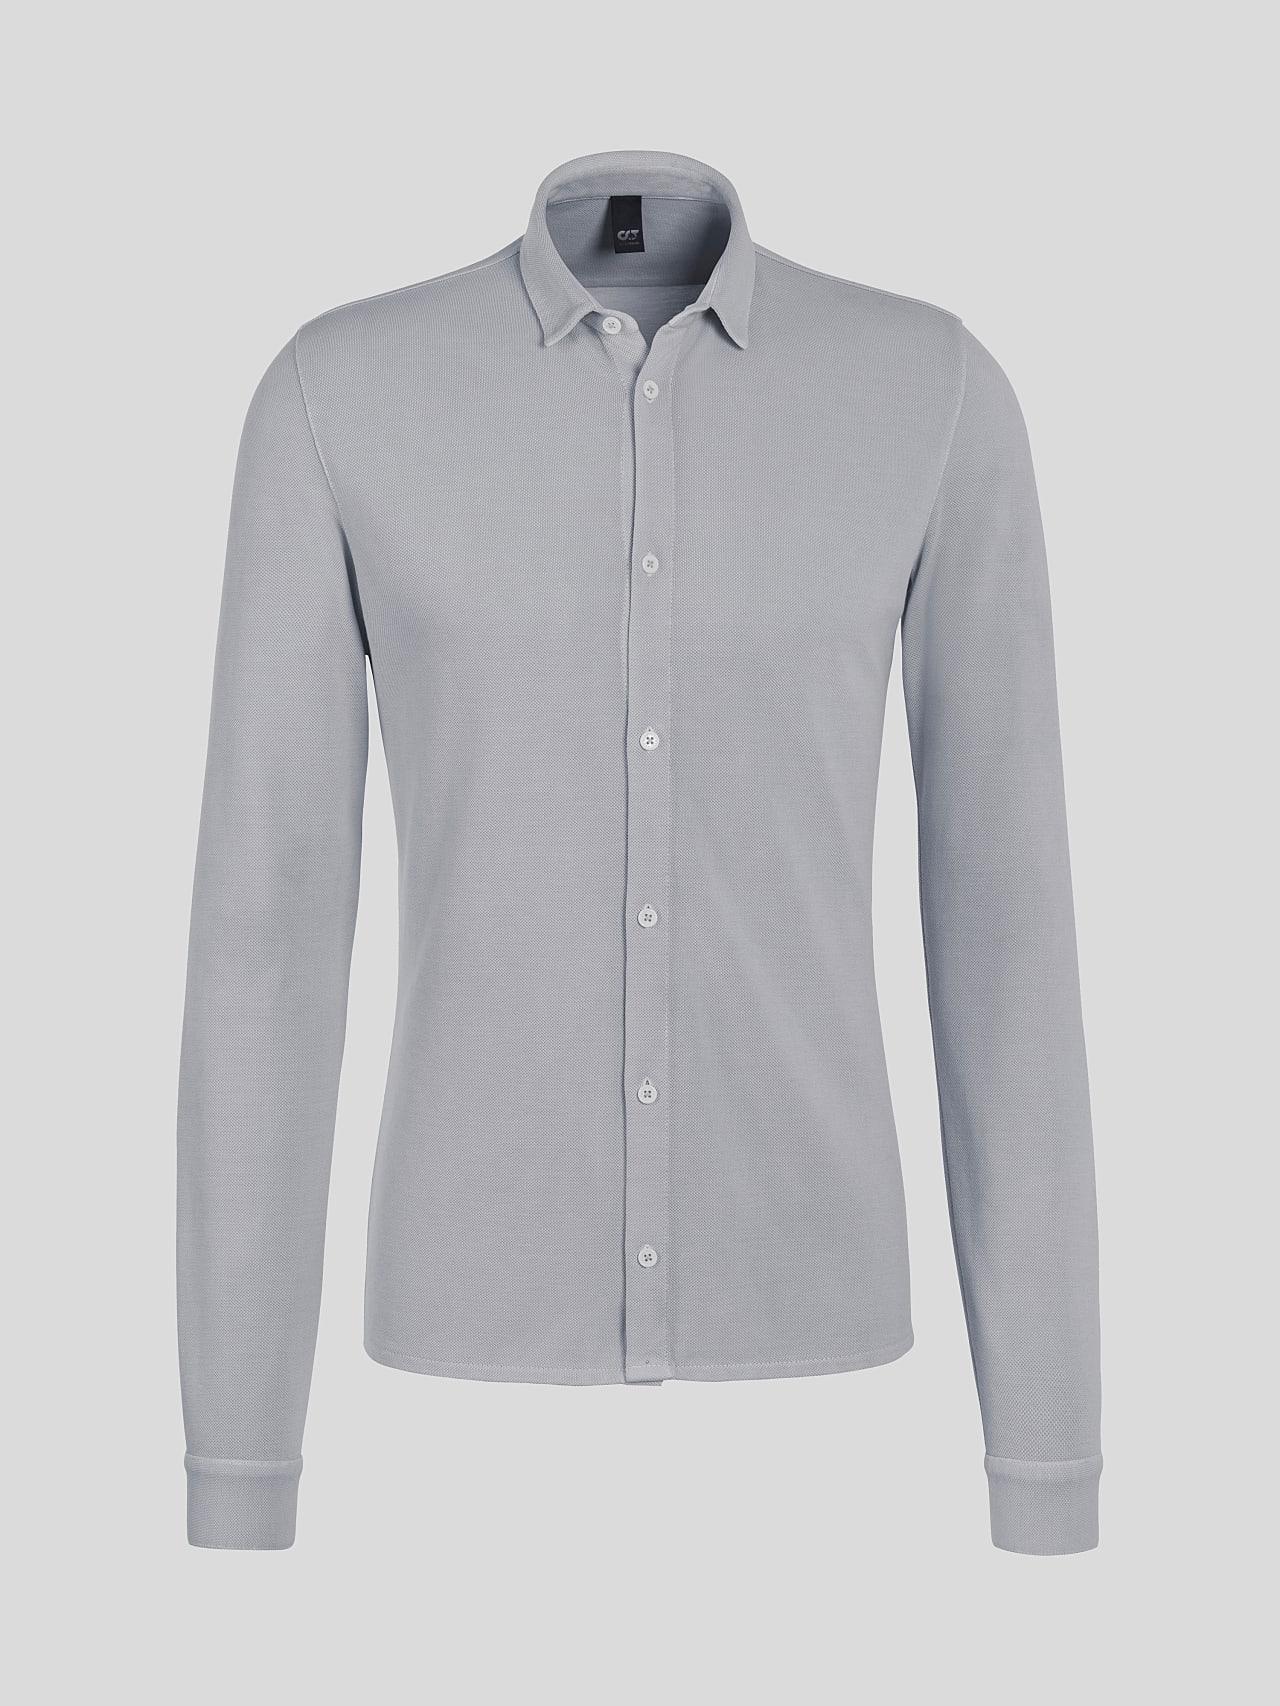 JIQUE V1.Y5.01 Pique Shirt with Kent Collar light grey Back Alpha Tauri